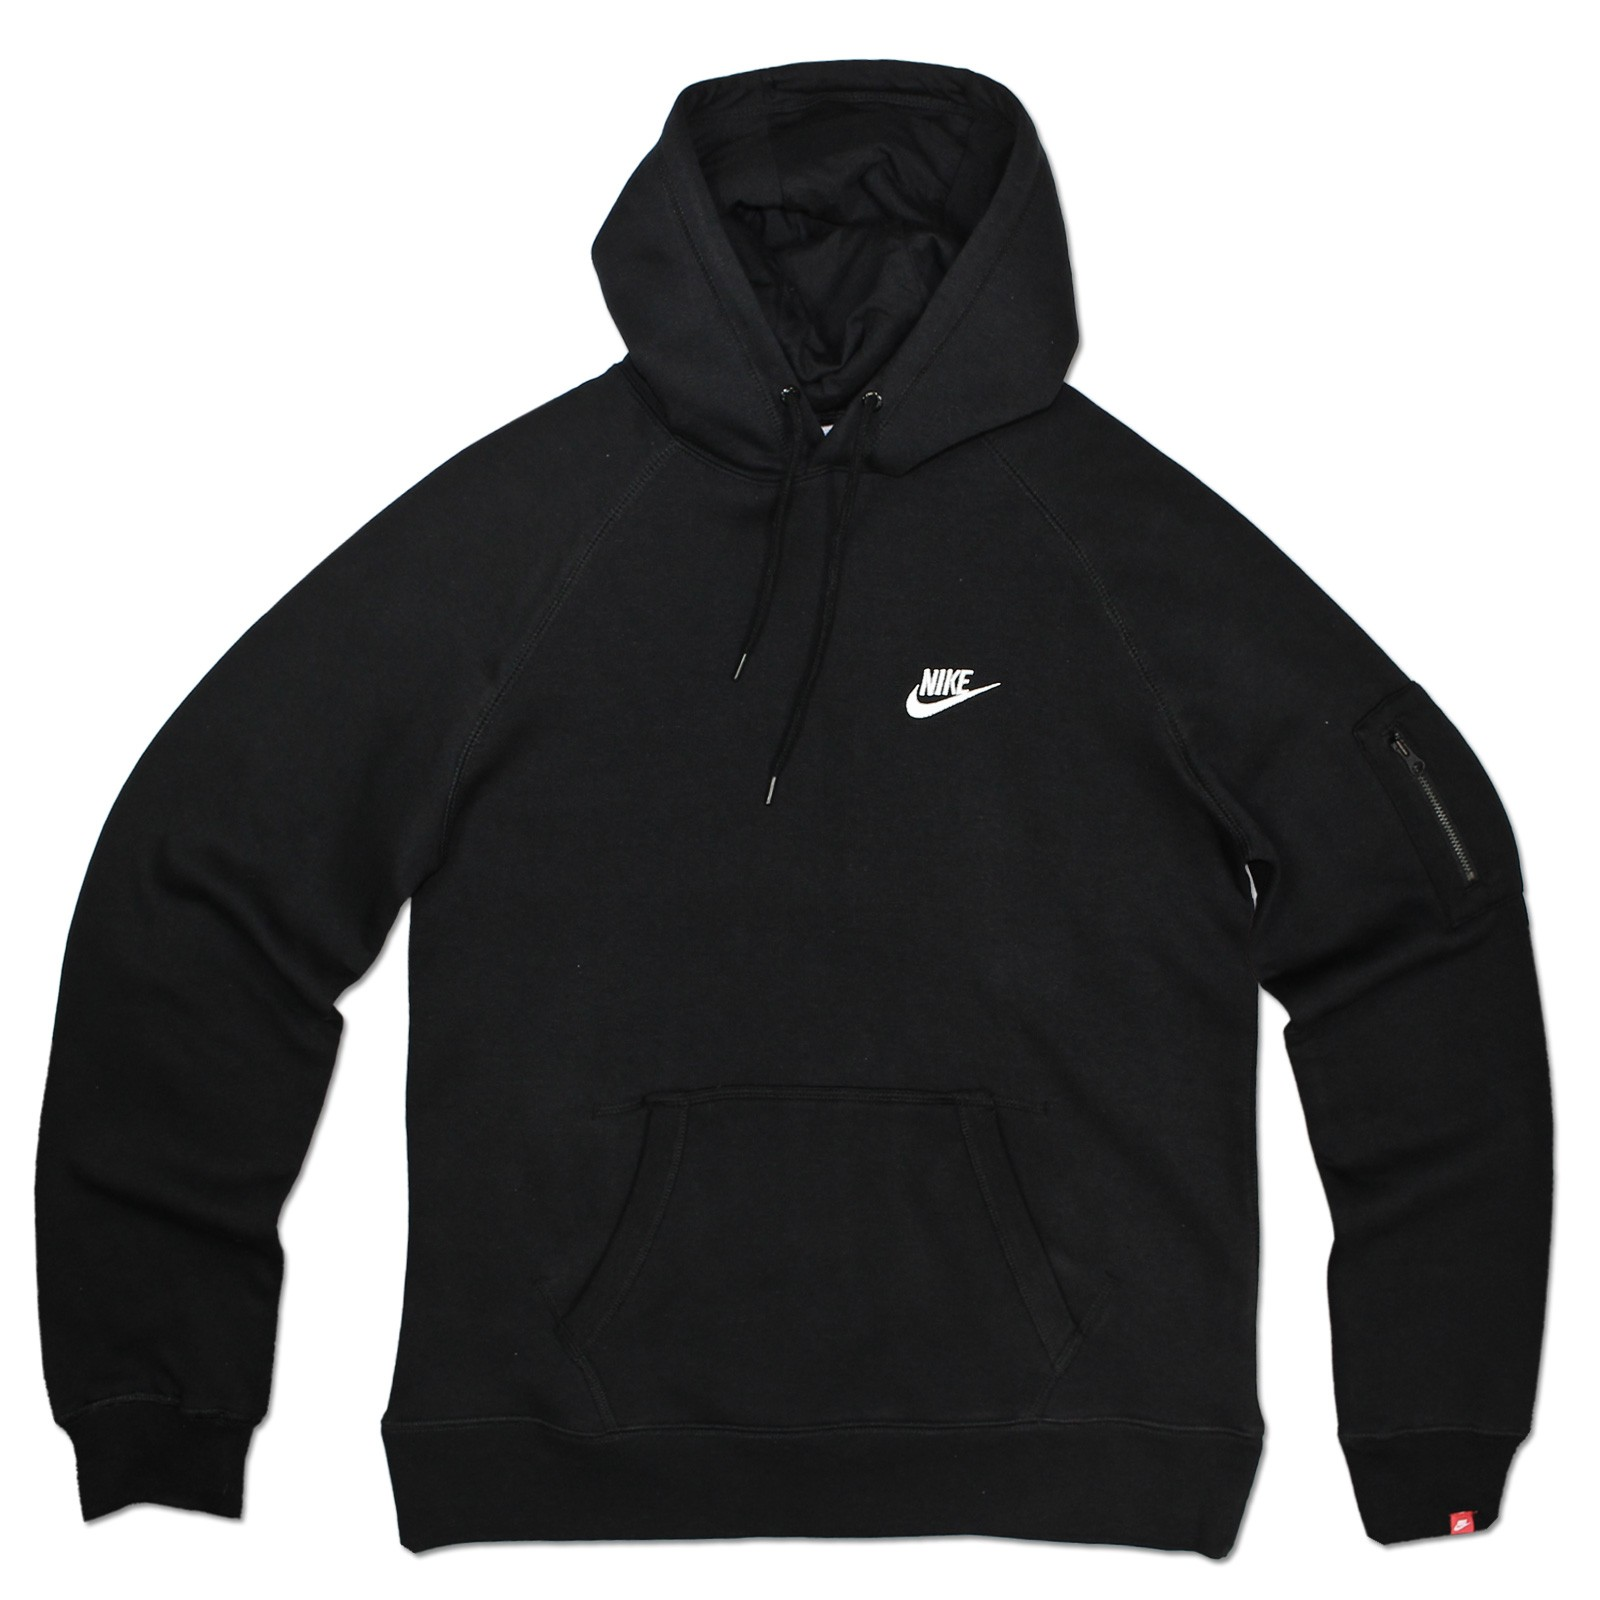 elegante dove posso comprare miglior sito web Nike Swoosh Hoodie Fleece Hood Sweater Hoody Hoody Sweatshirt ...